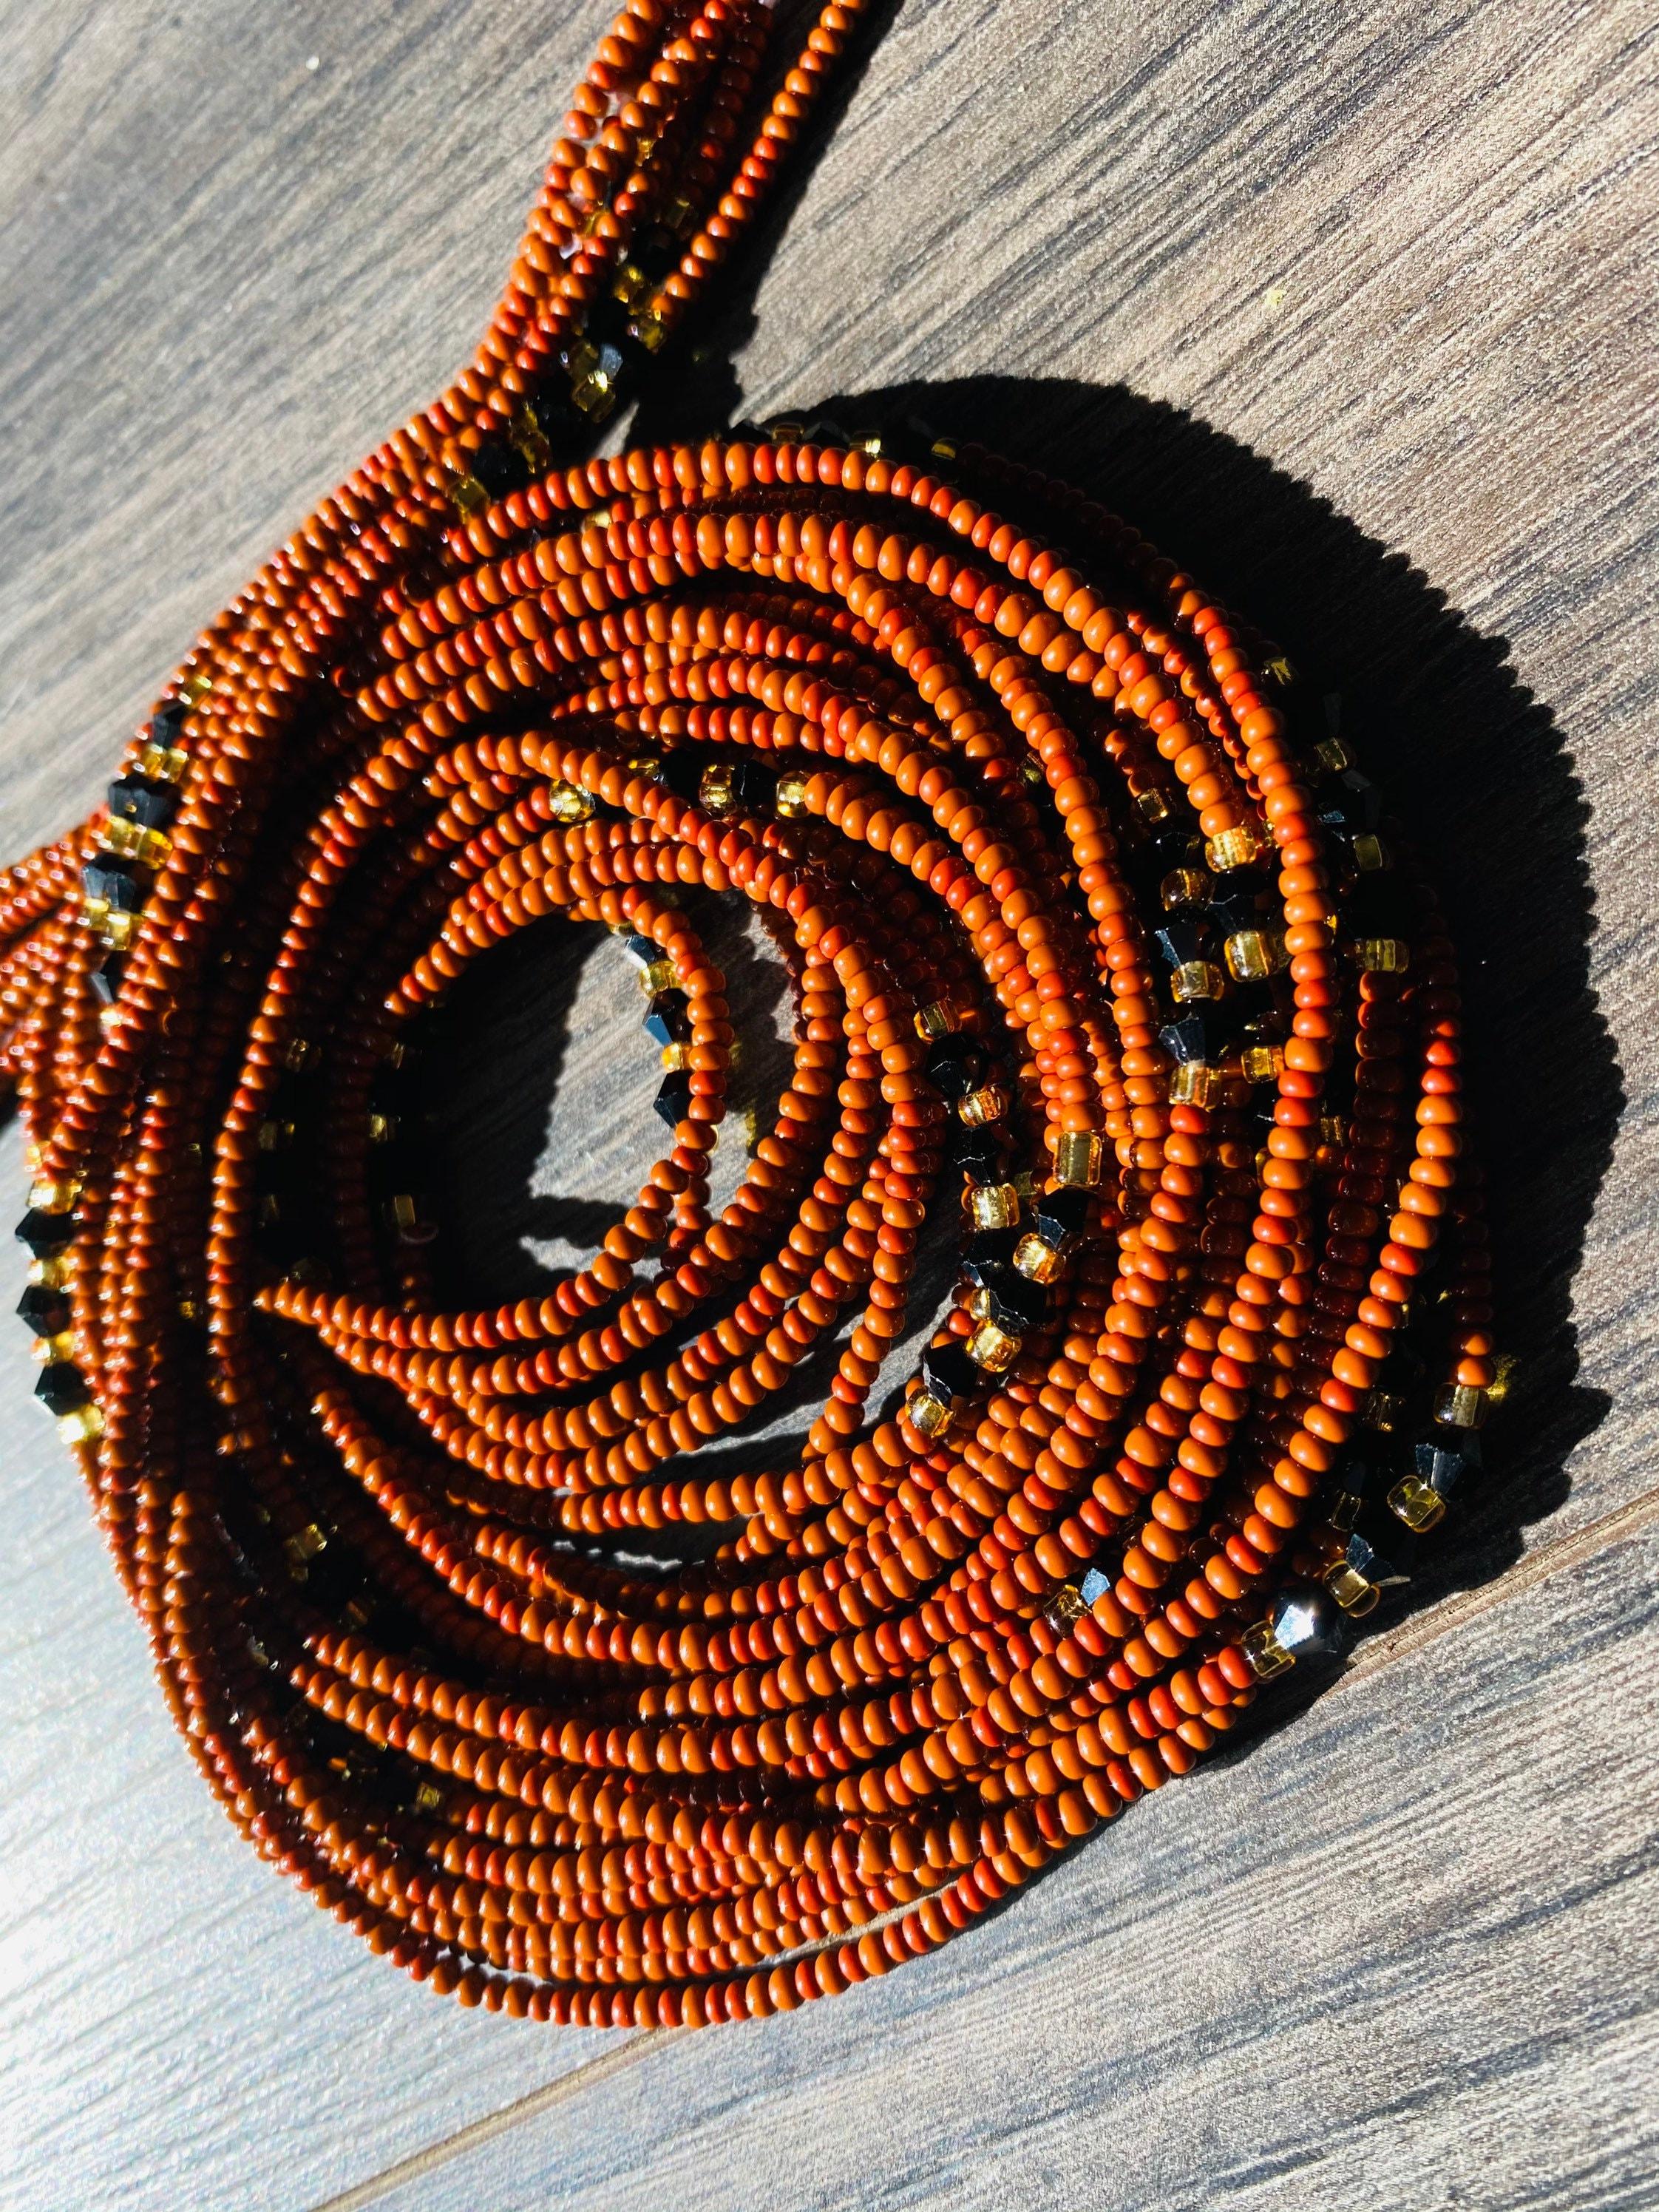 FREE SHIPPING Waisted Beads for women tummy chain waist Czech  Waist Beads Wholesale- WaistBeads with crystals- Belly chain Czech Beads